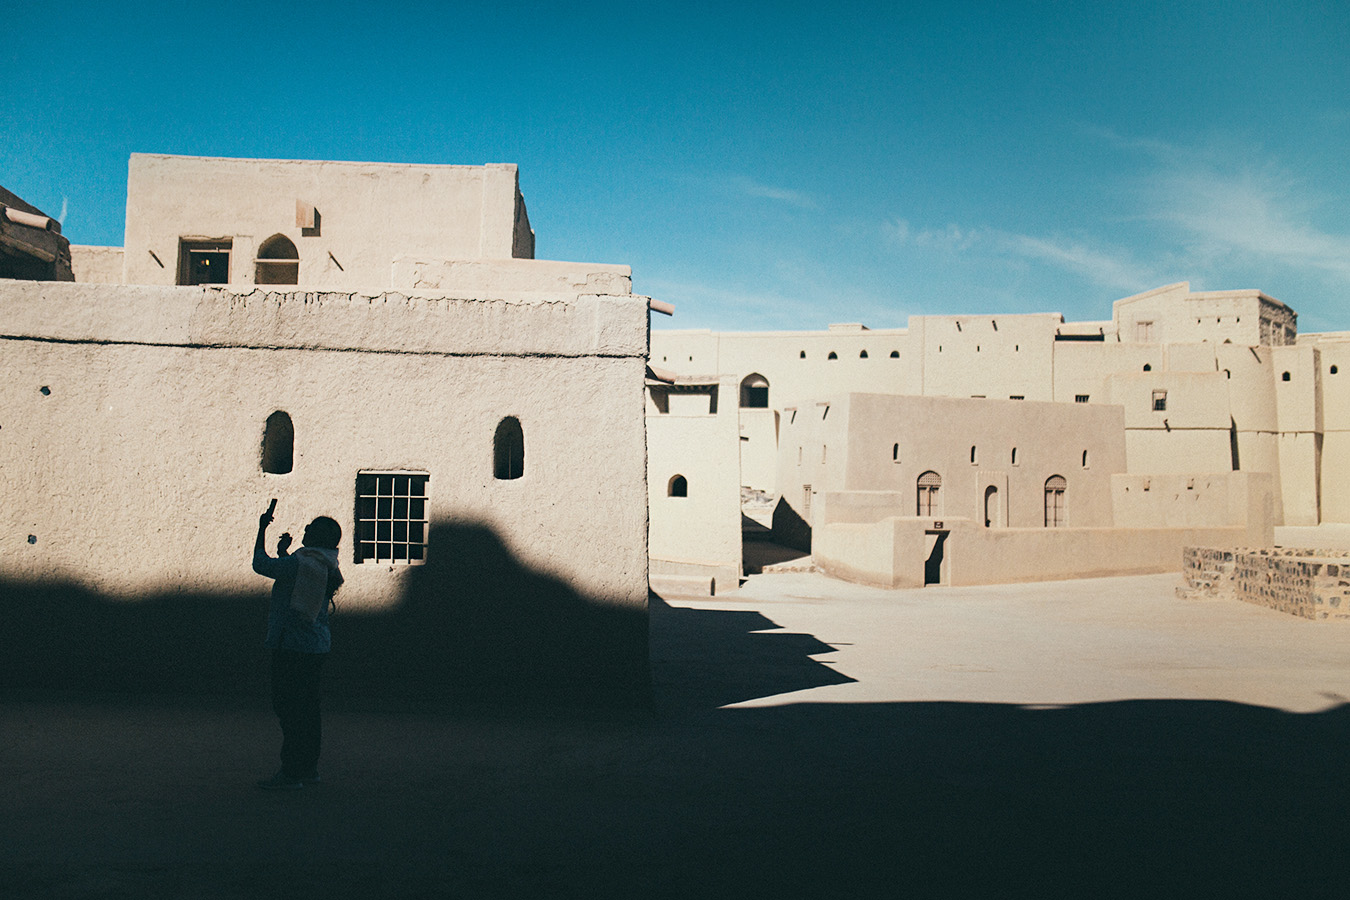 Fart Bahla, Oman